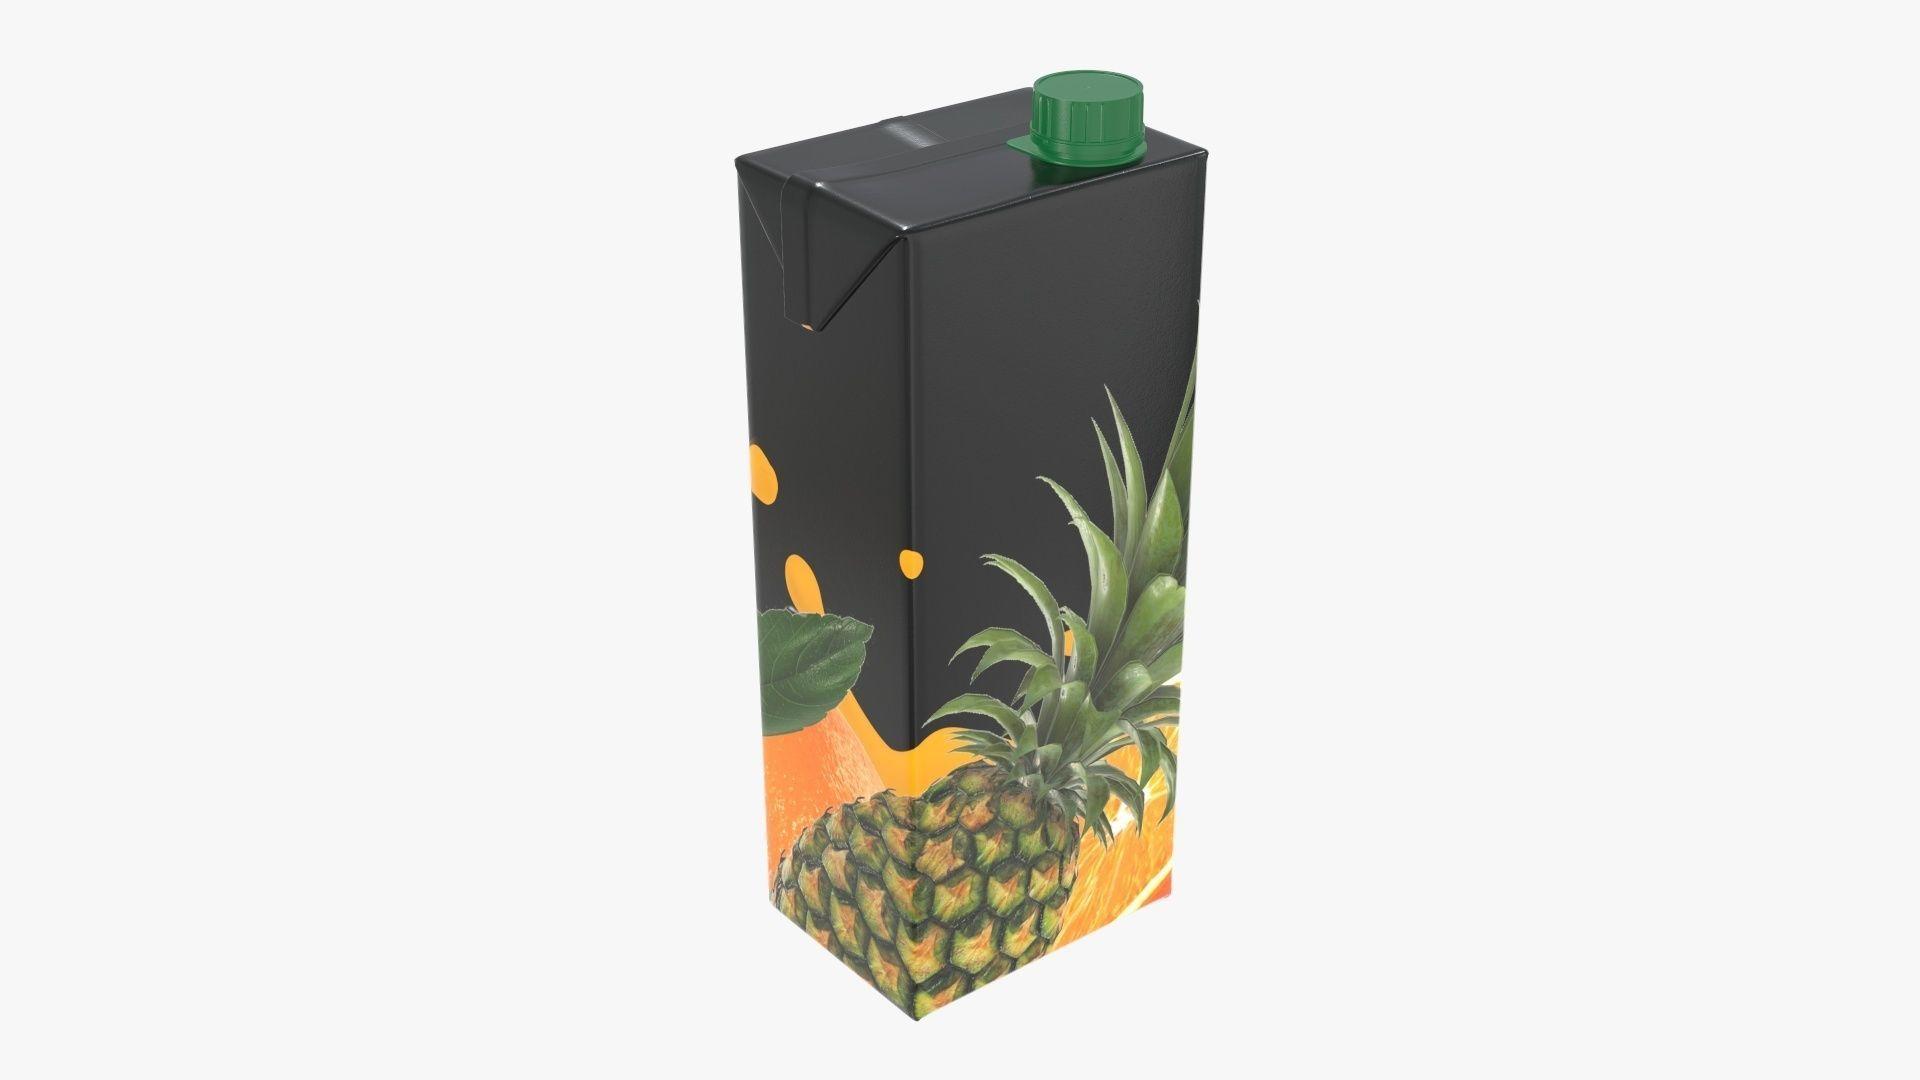 Juice 1500ml cardboard box packaging with cap